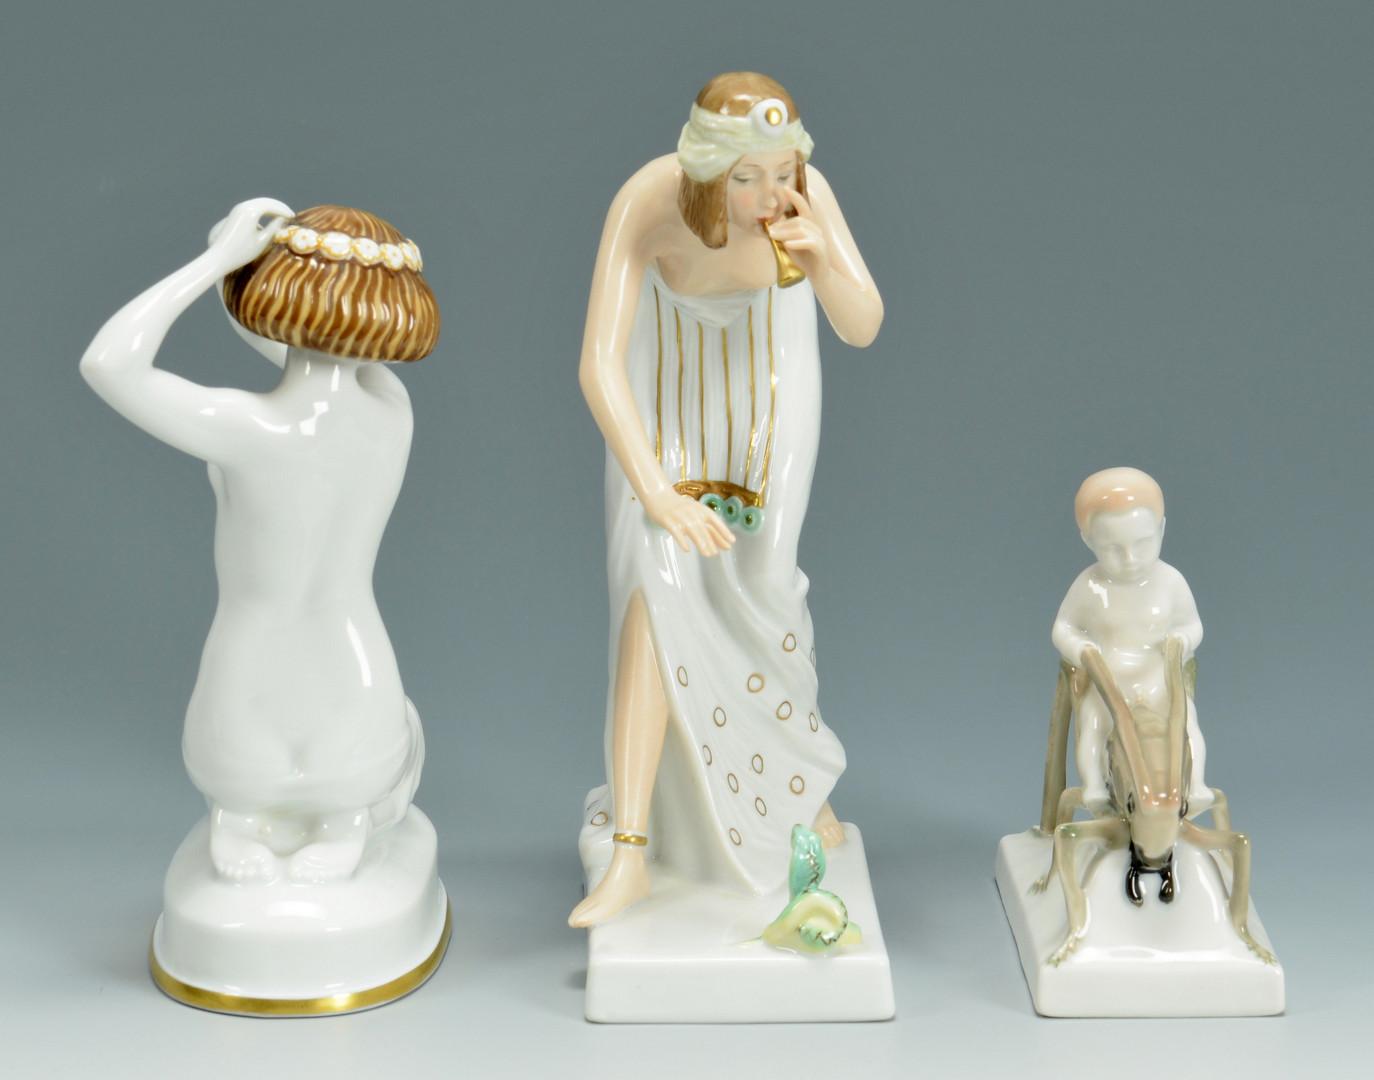 Lot 450: Three Rosenthal figures, Caasmann